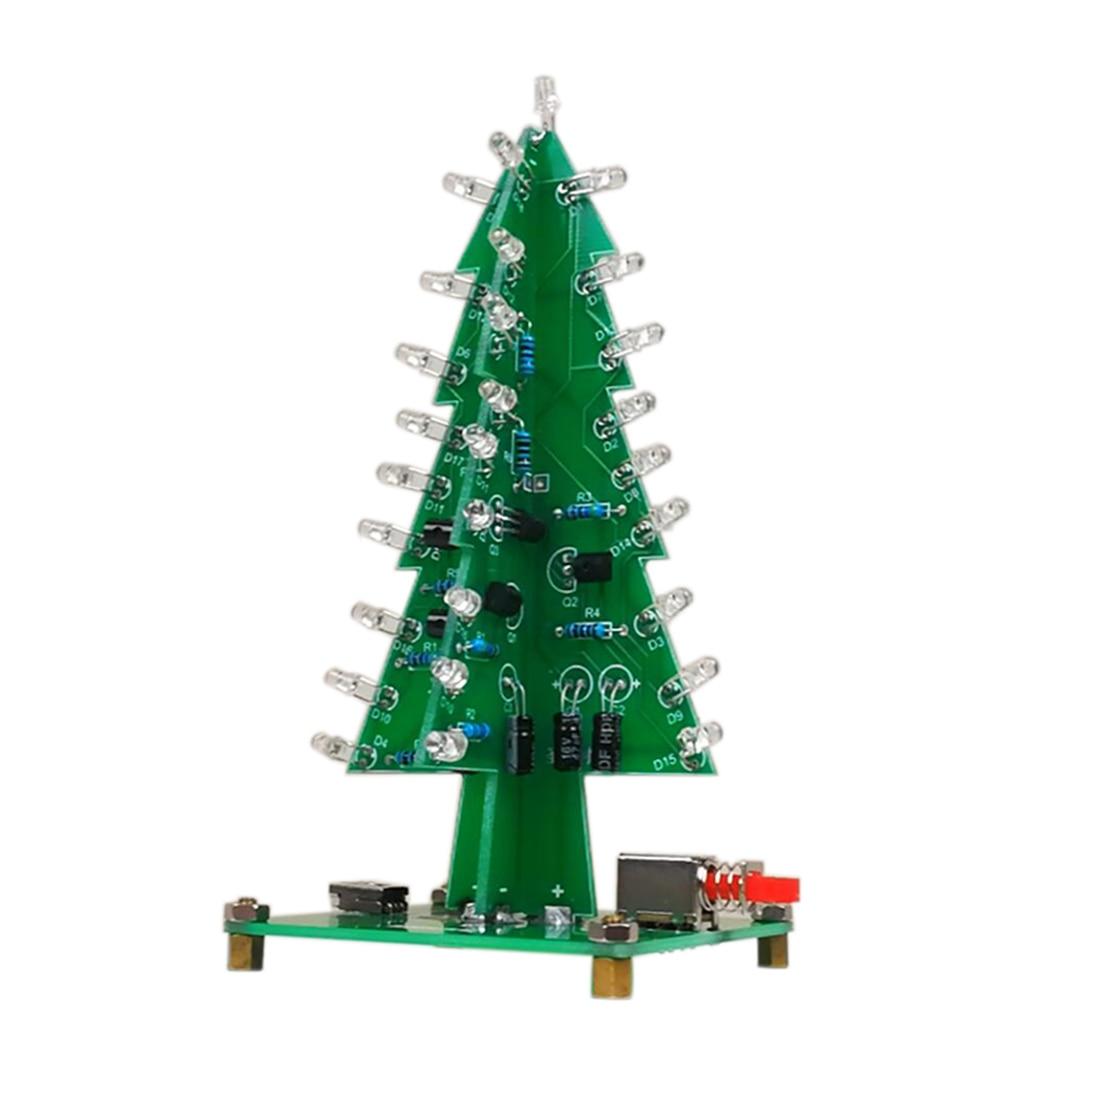 DIY Colorful LED Display Lamp DIY Welding Light Kits DIY Lamp Brain-Training Toy For Children Educational Toys Gift - Flash Tree